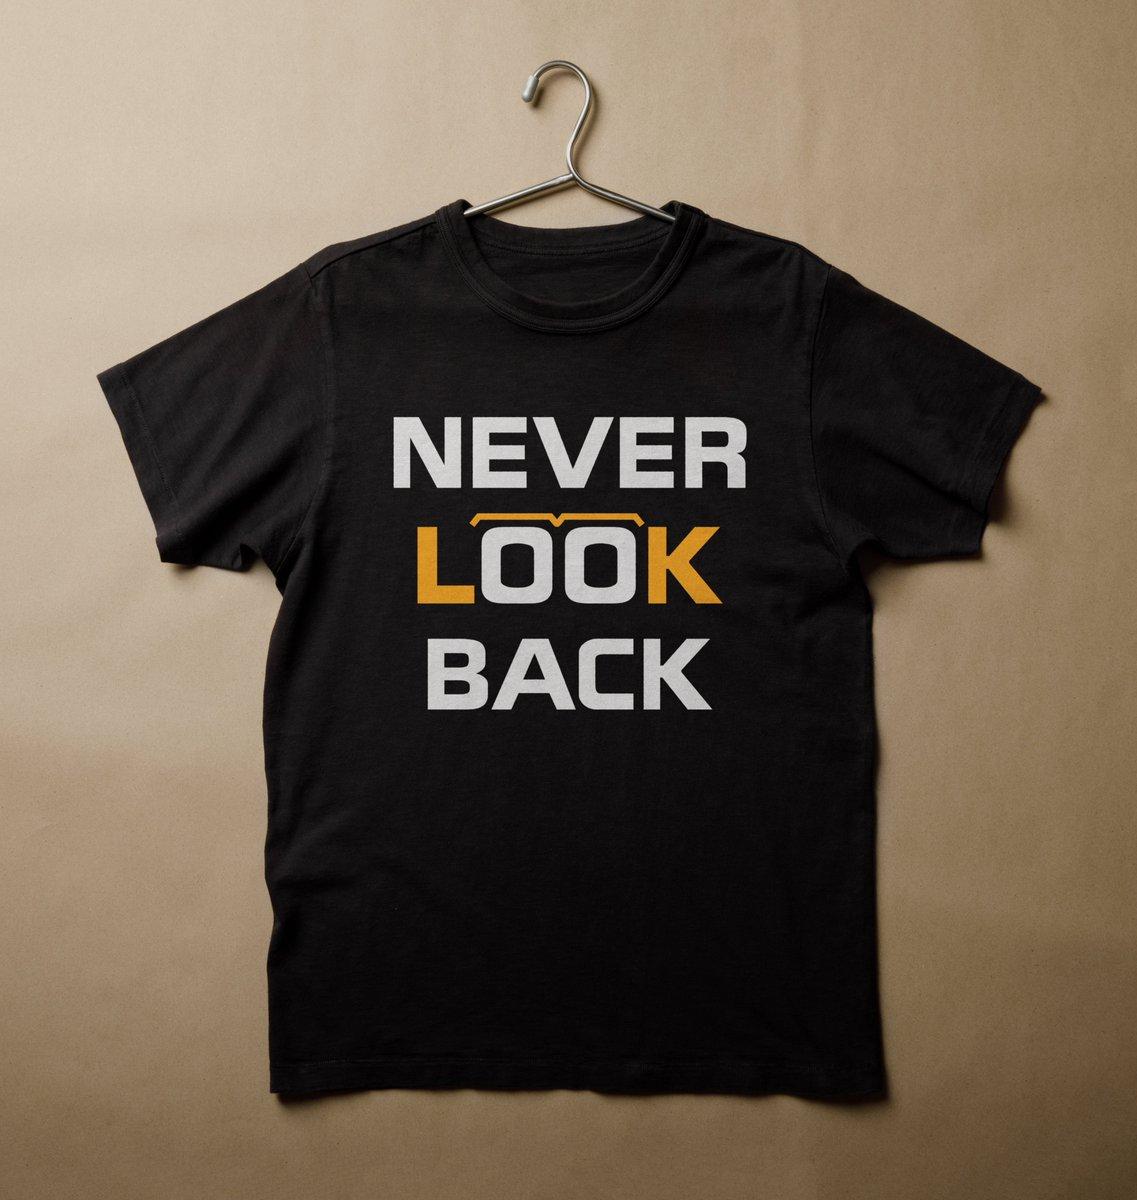 500+ t-shirt designs together.  Download link: https://t.co/GVbk4Pesp9   #tshirt #tshirtdesign   #vector  #printondemand  #merchbyamazonshirt #tshirtstore #teespring #typography  #esty  #gym  #art  #USA  #fitness  #Thanksgiving https://t.co/NgdthwJCUv